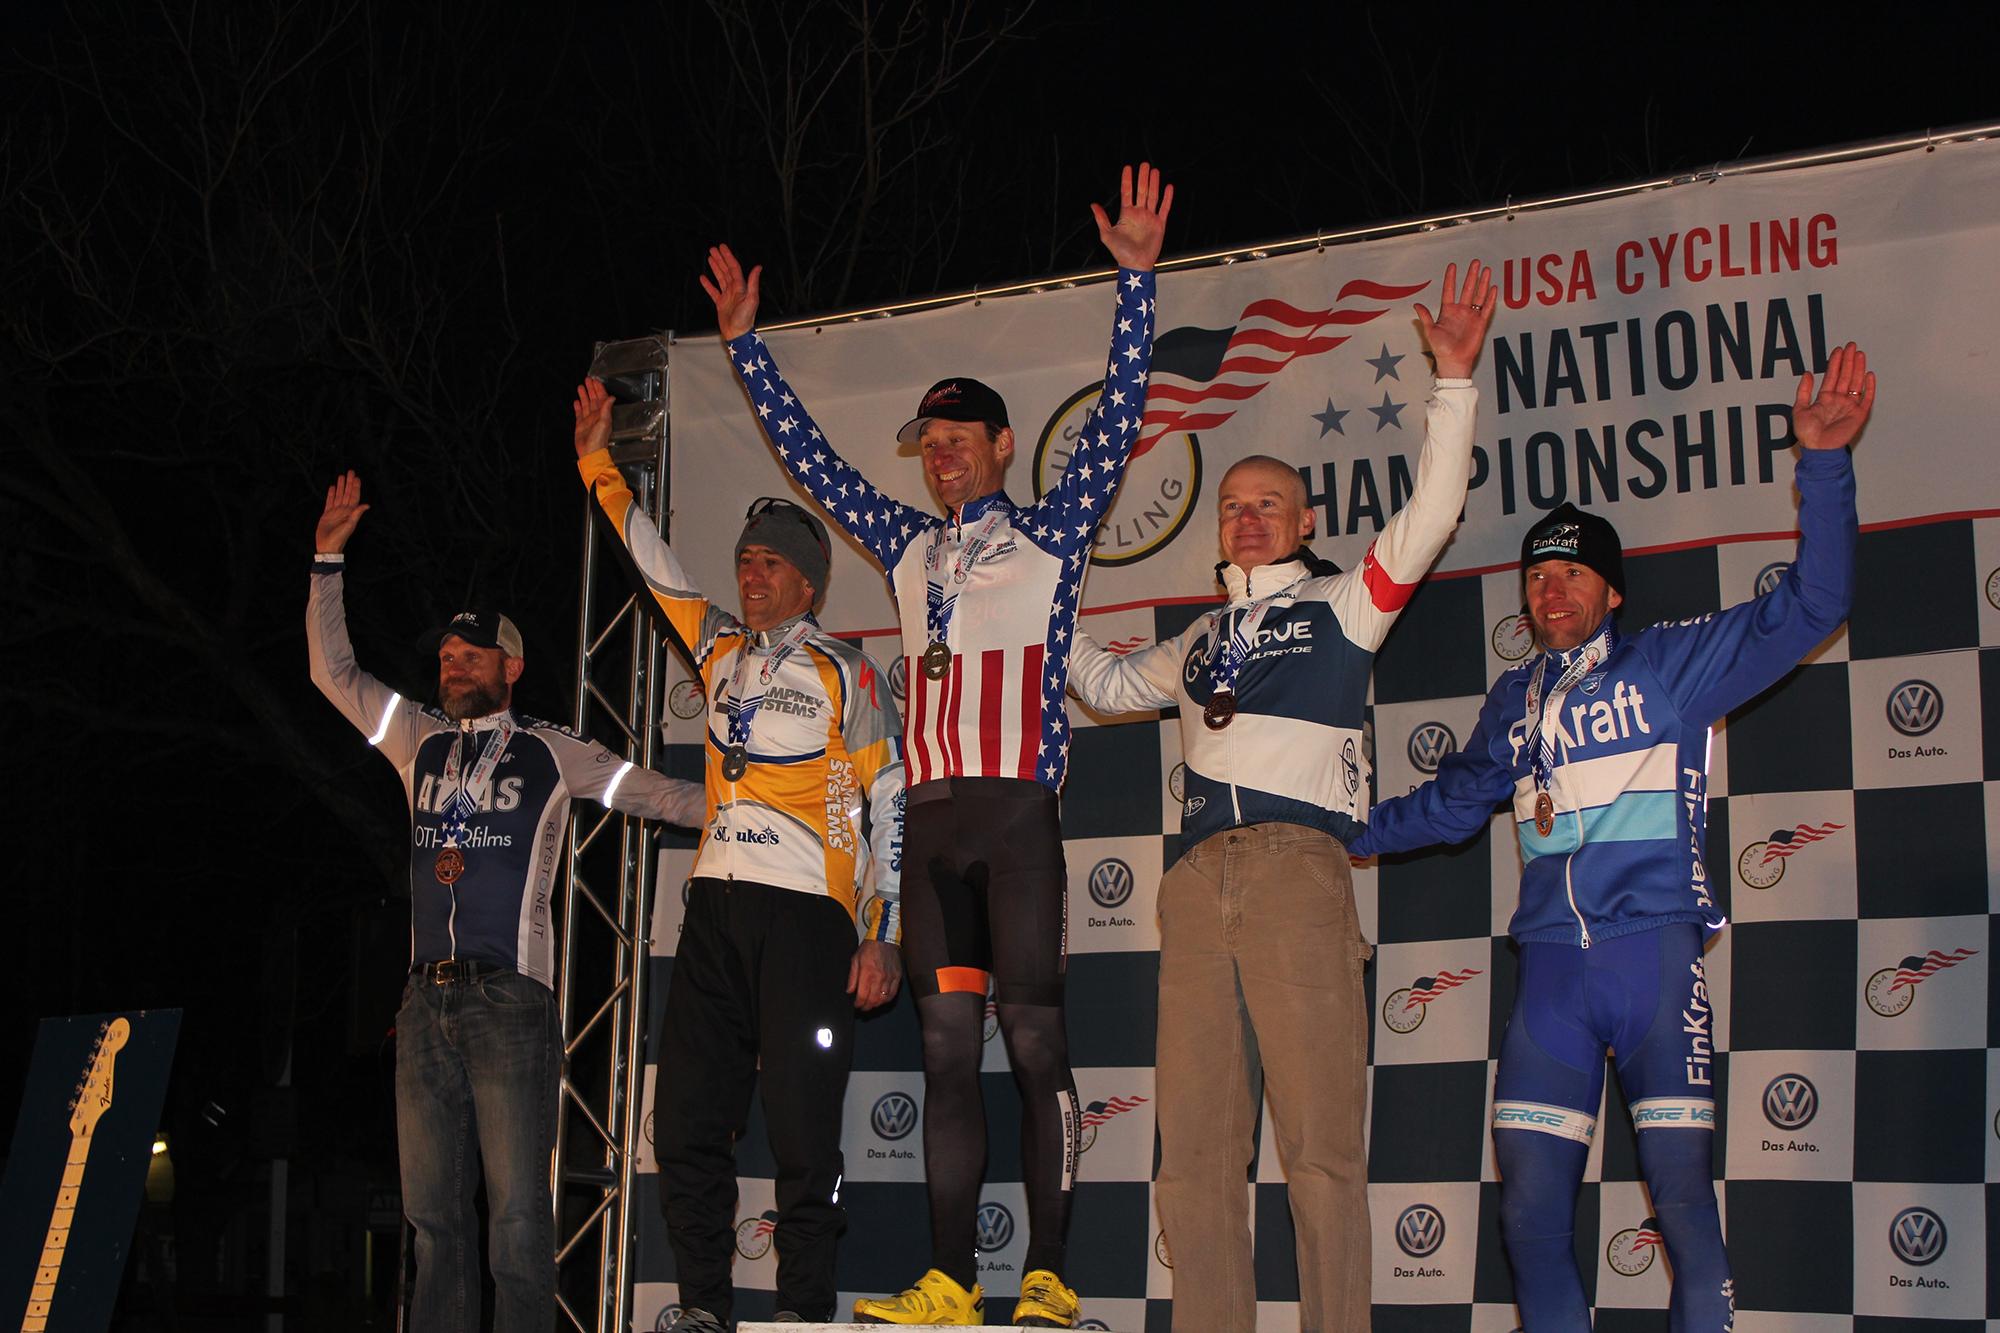 Cross nats podium